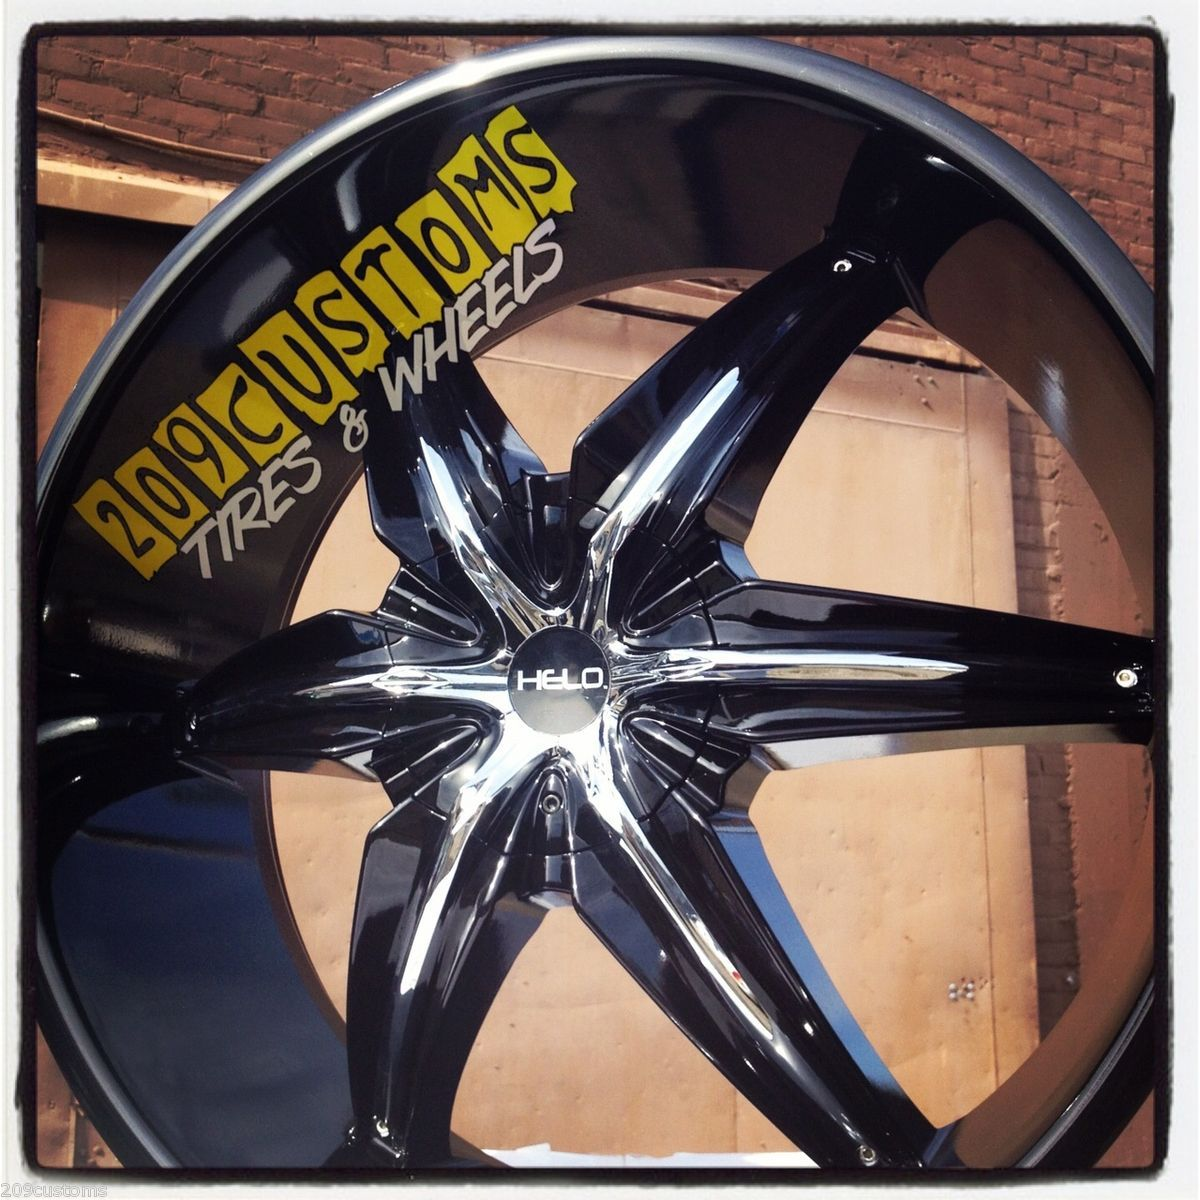 24 24 inch Helo 866 Black Wheels Rims Tires 6x139 7 Escalade Tahoe